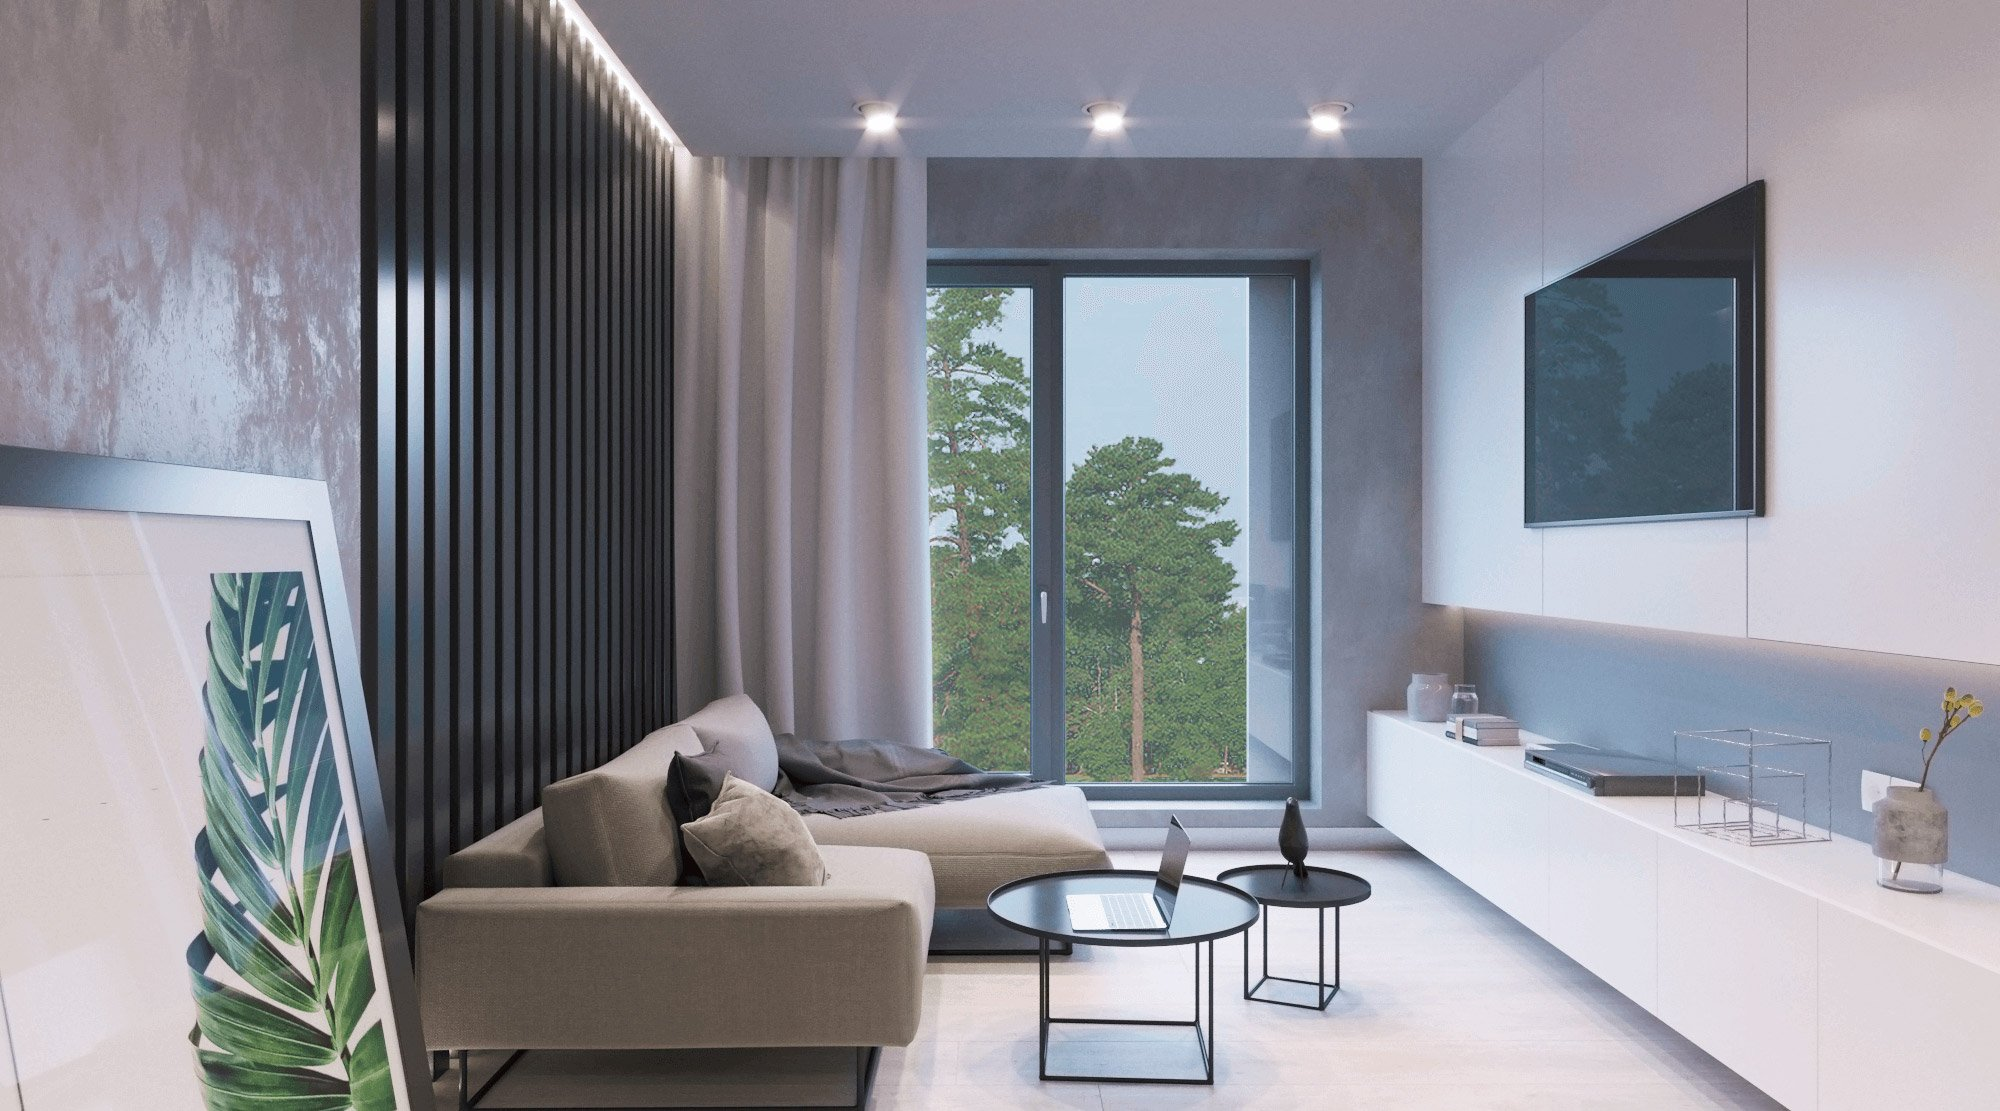 Stylish interior design living room